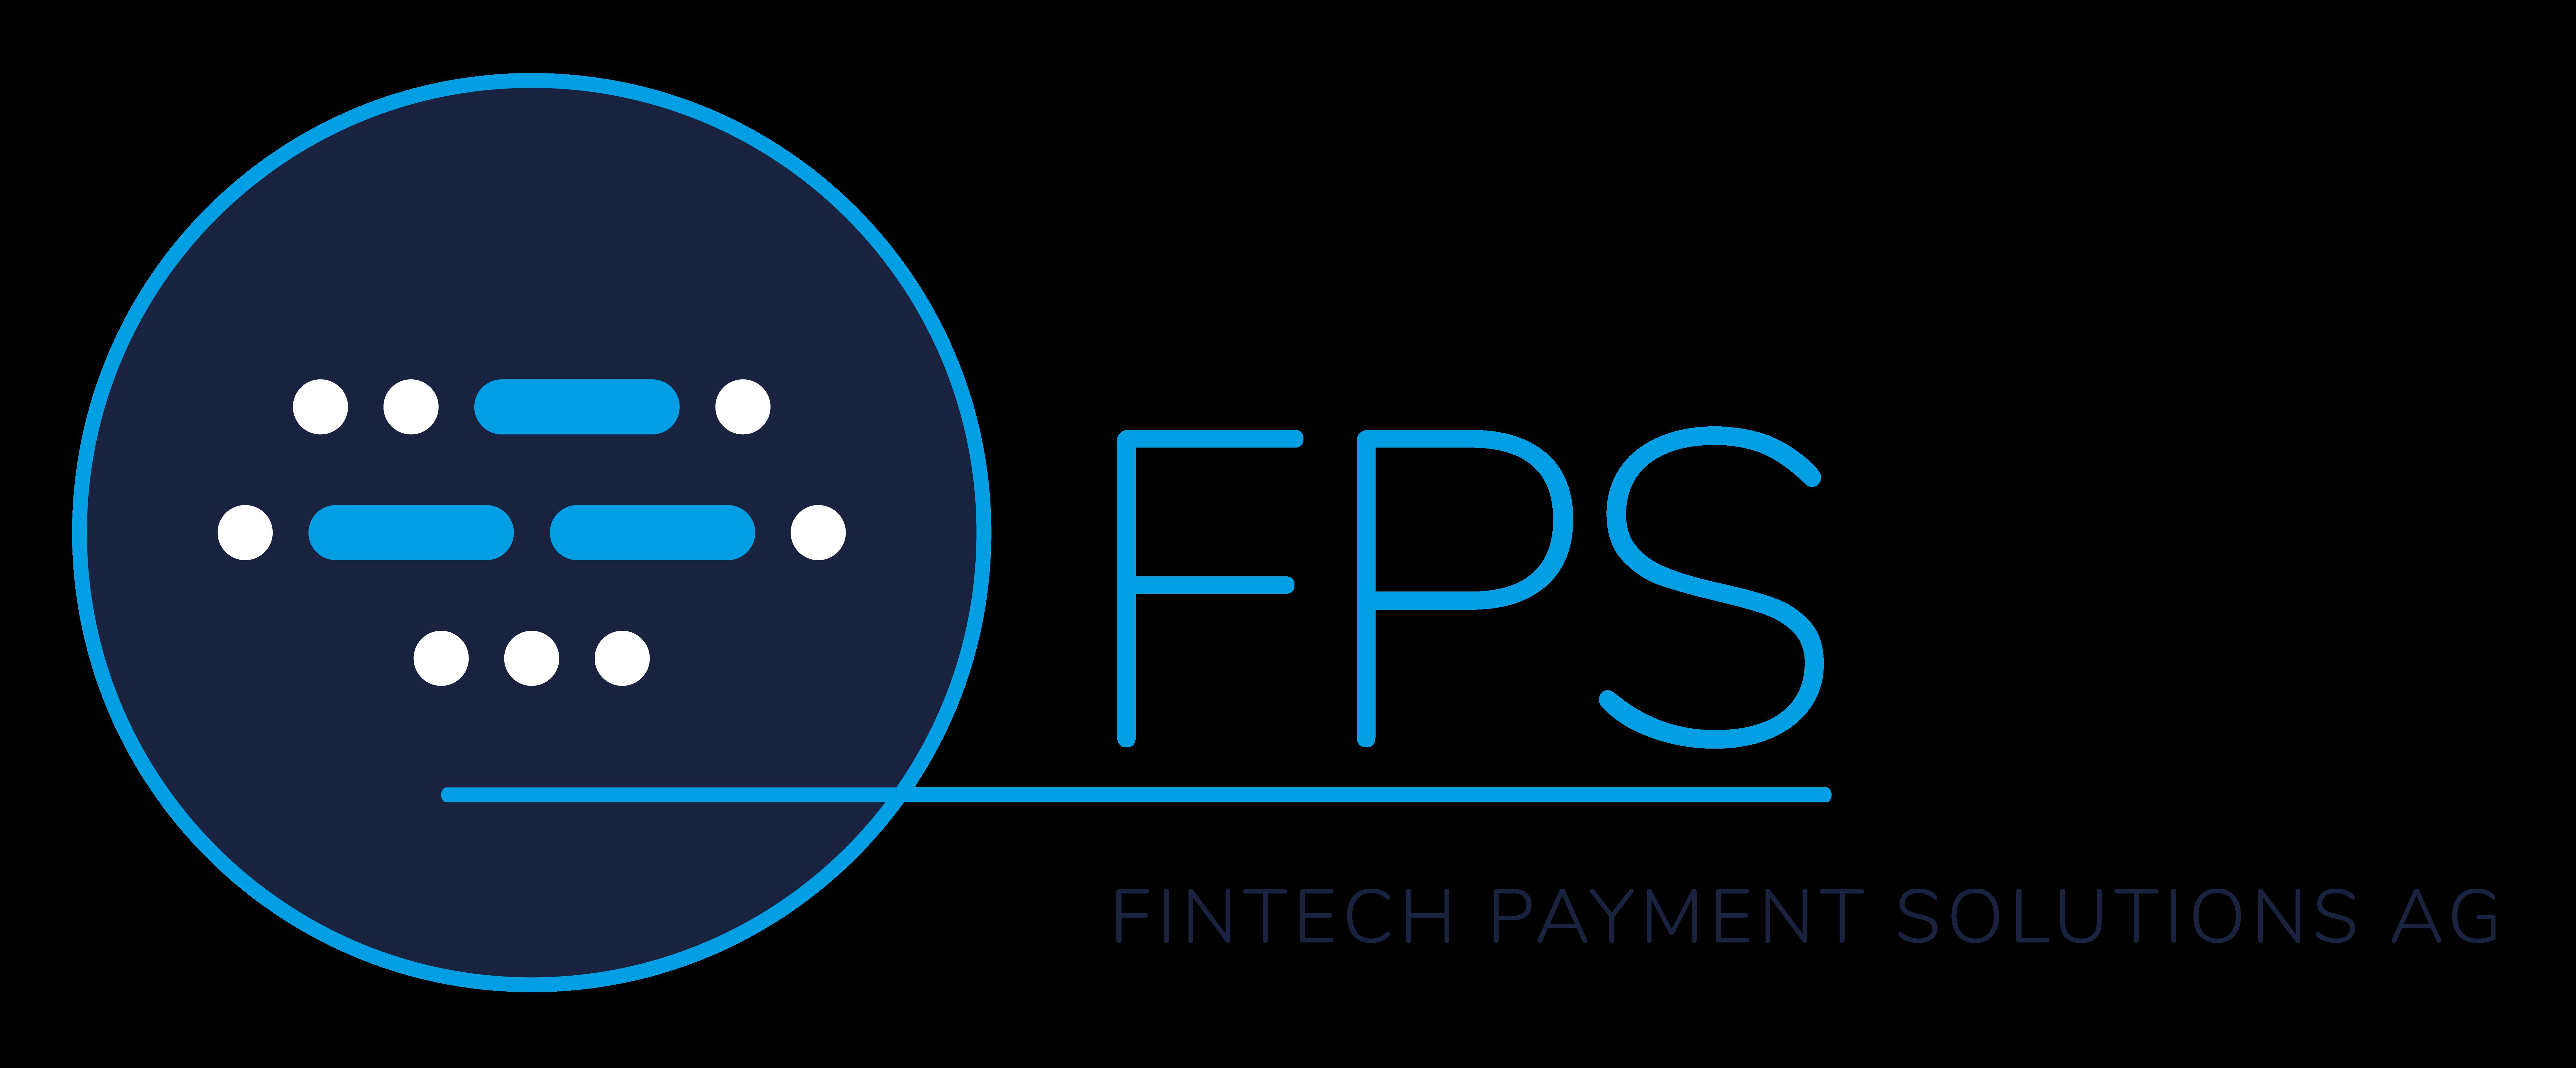 Fintech Payment Solutions AG / Konkurrenz Smartphone, Startup, Algorithmus: Ablösung des Bargeldes